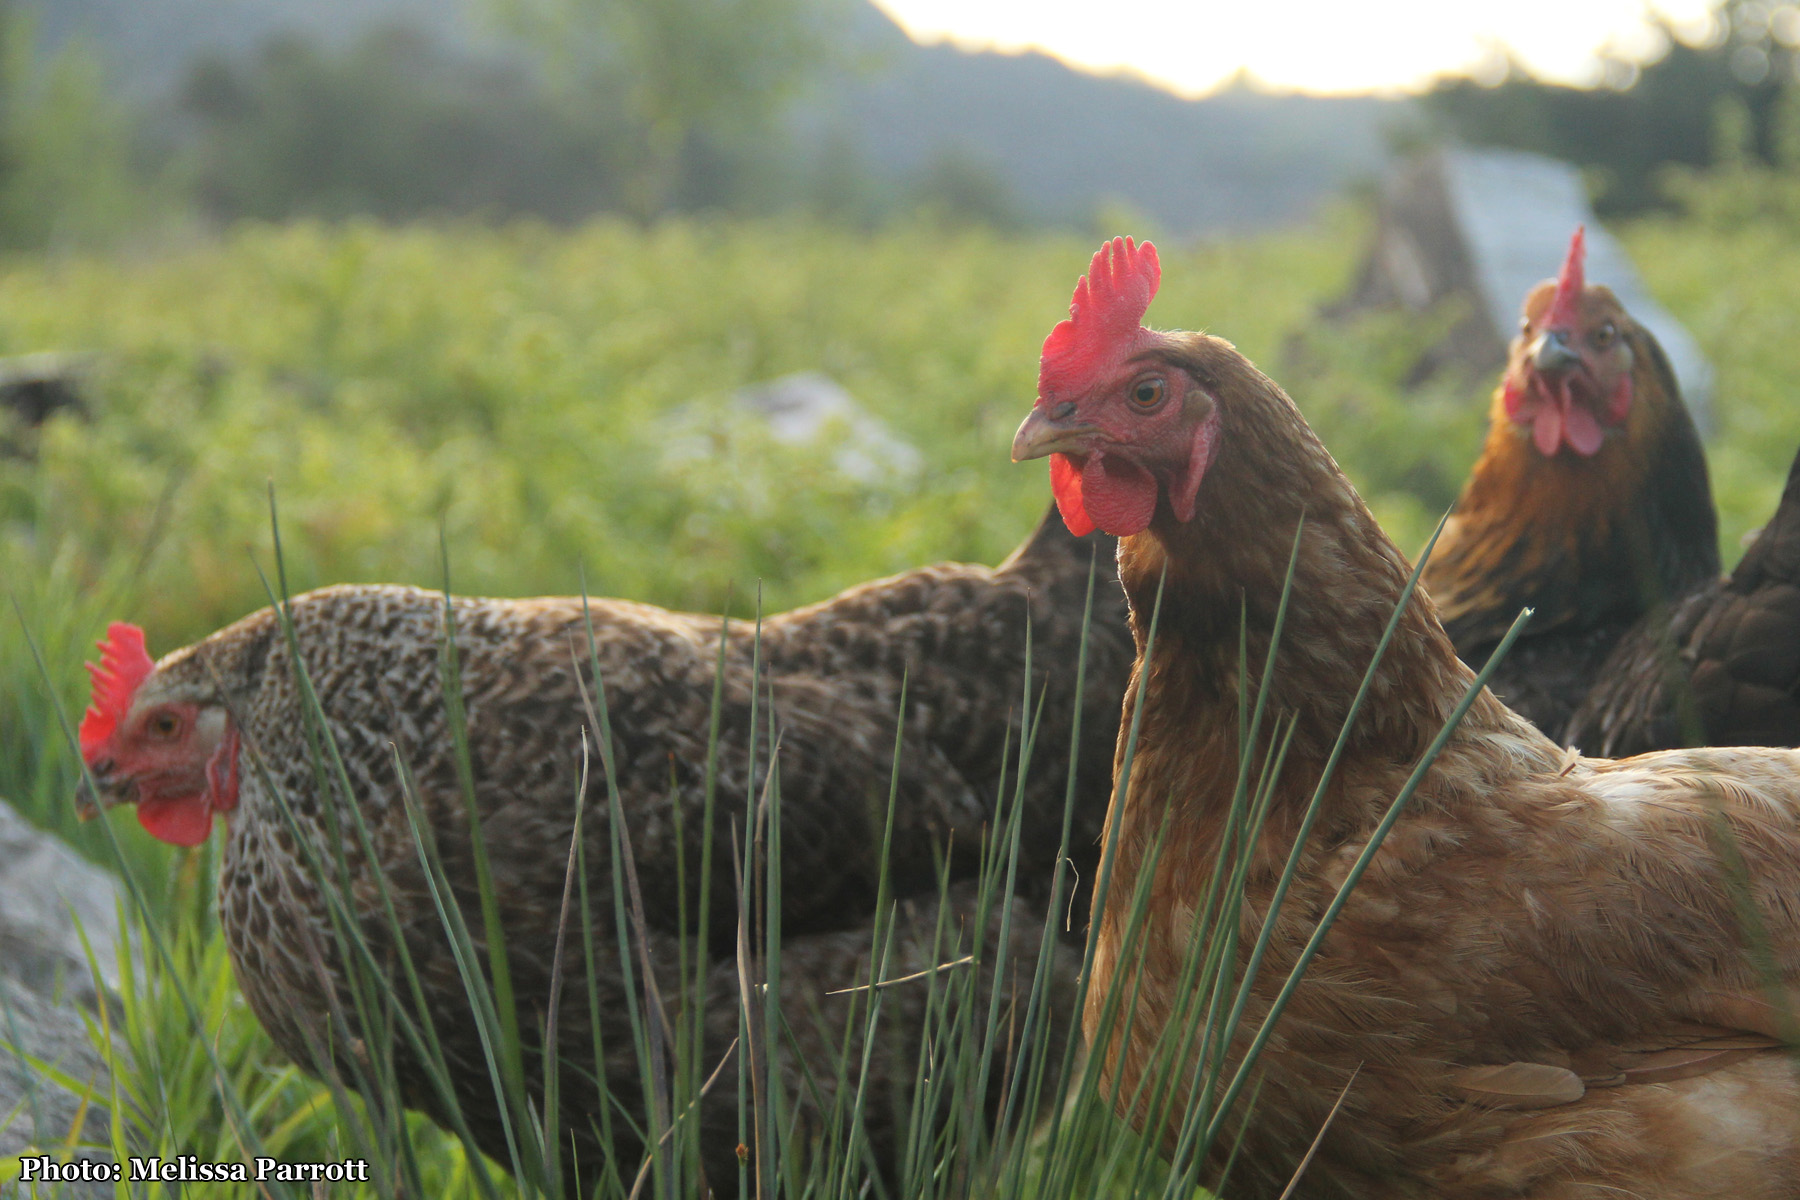 Hens on the farm mean fresh eggs for breakfast!